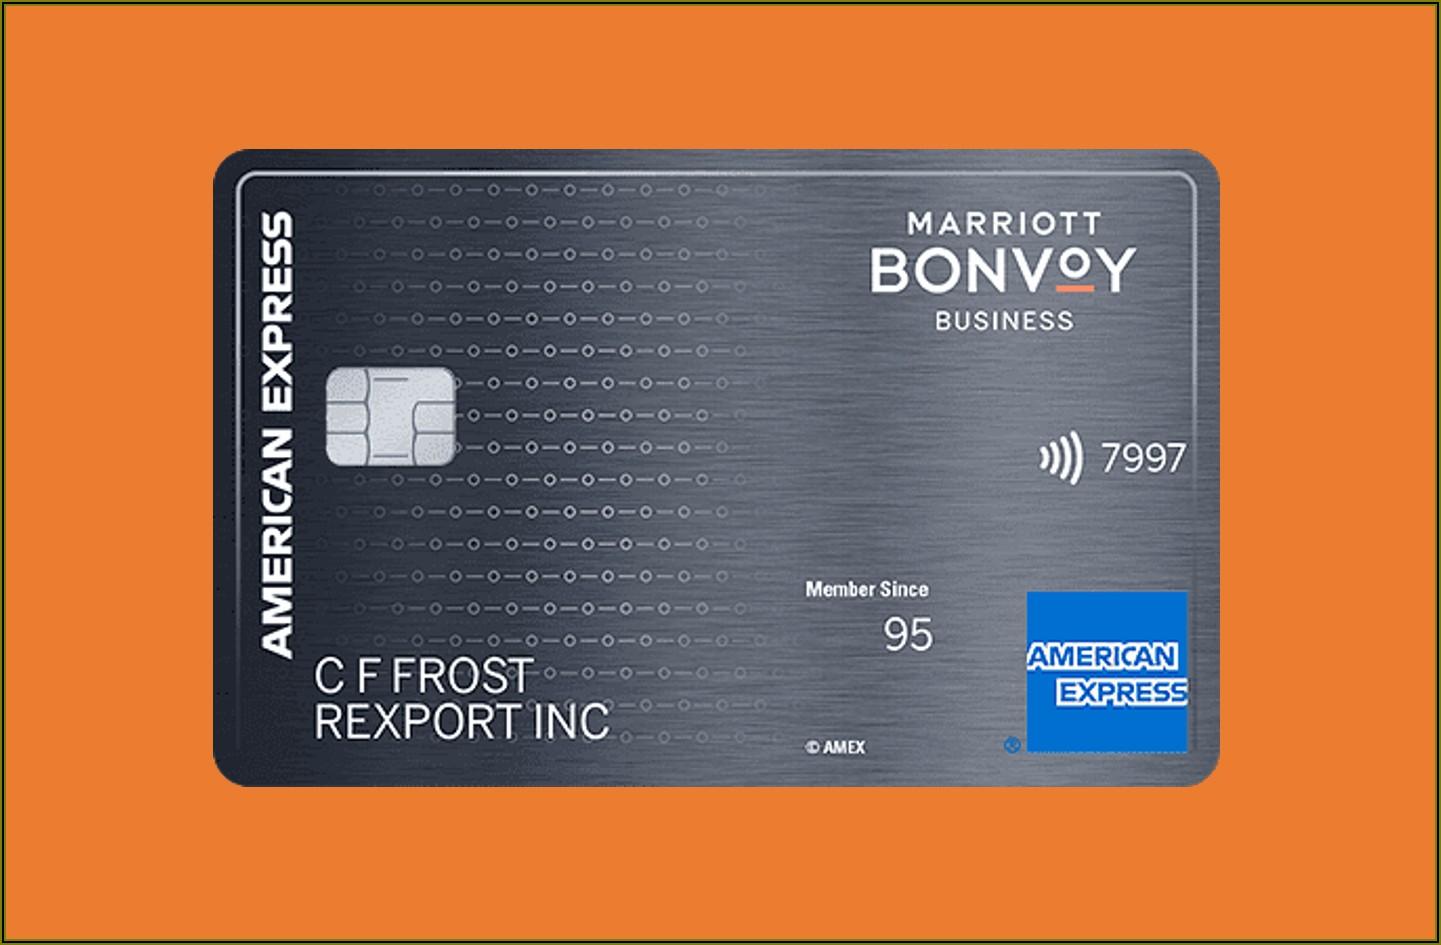 Marriott Business Card Amex